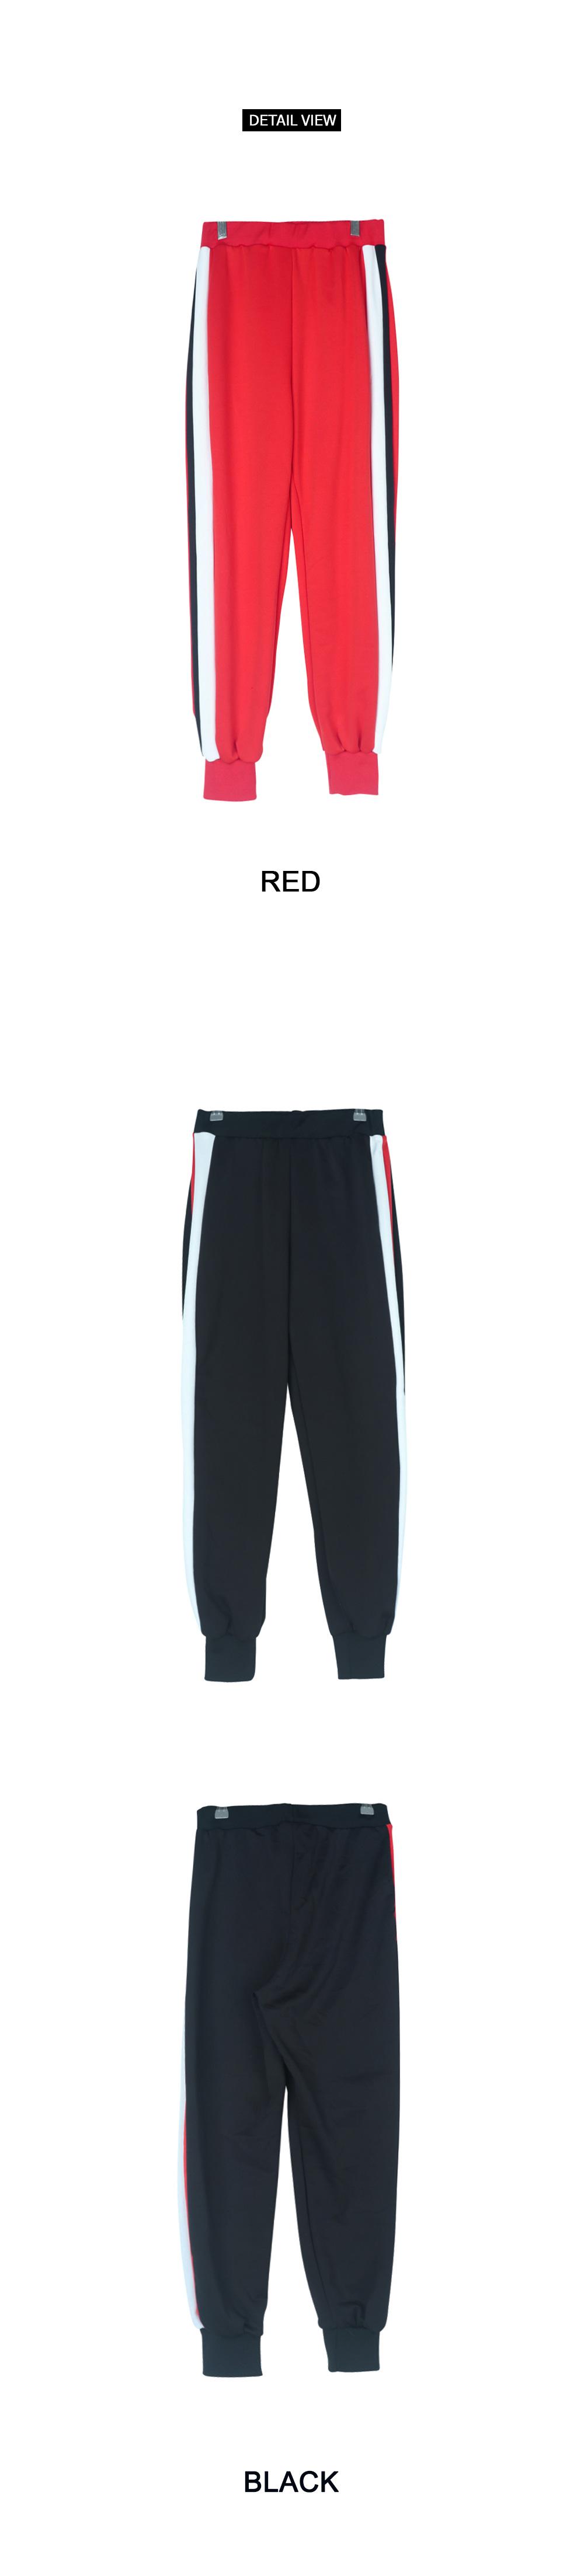 Valentine's Jogger Pants